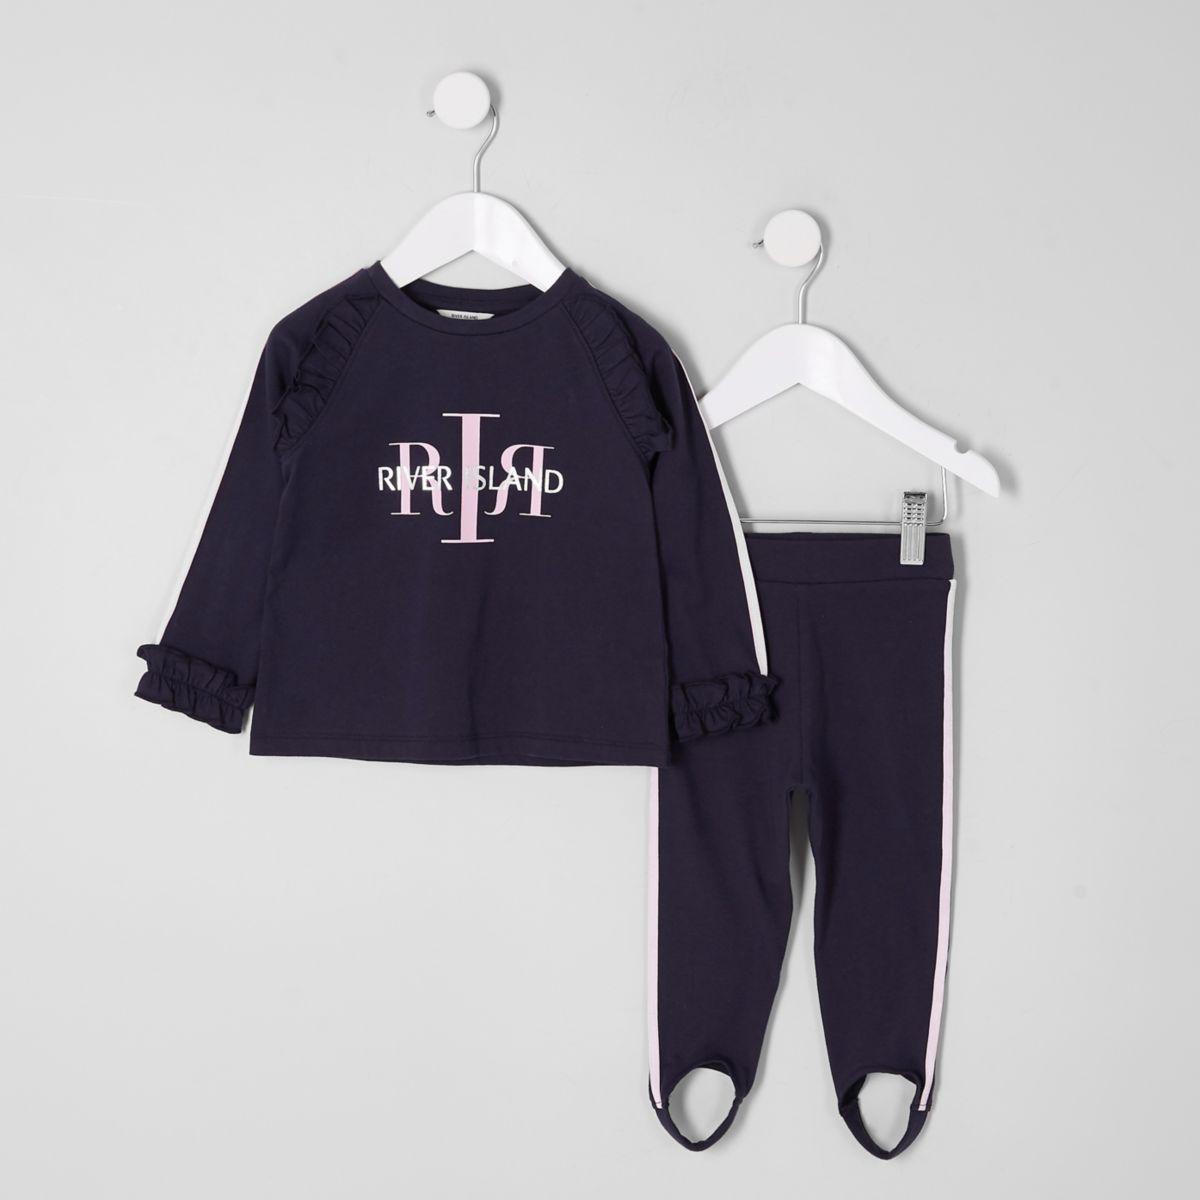 guetter courir chaussures 100% de qualité Mini girls navy RI top and leggings outfit